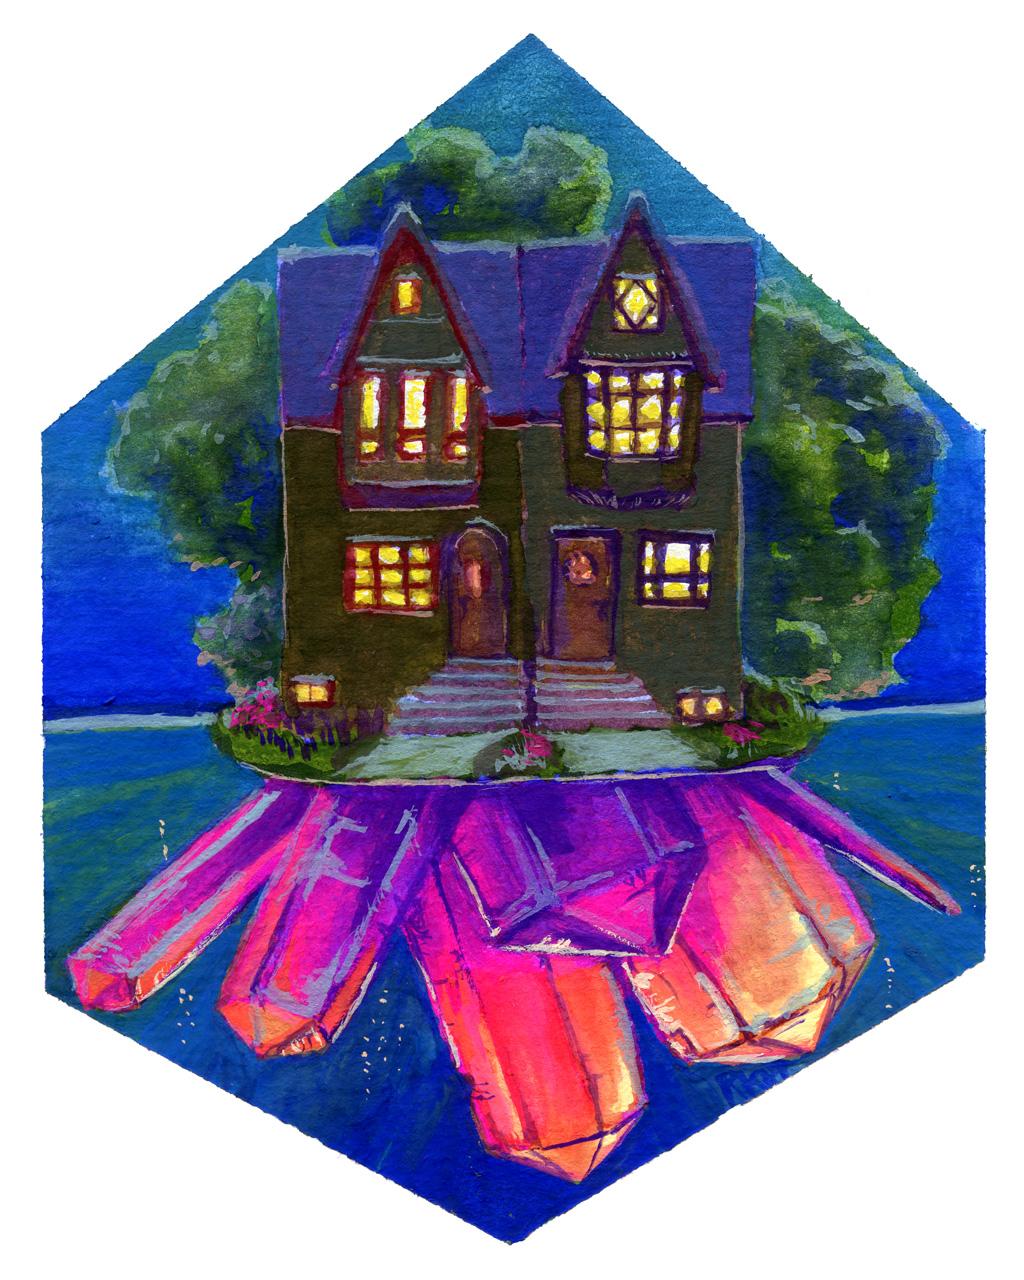 Neighbourhood Crystal Island